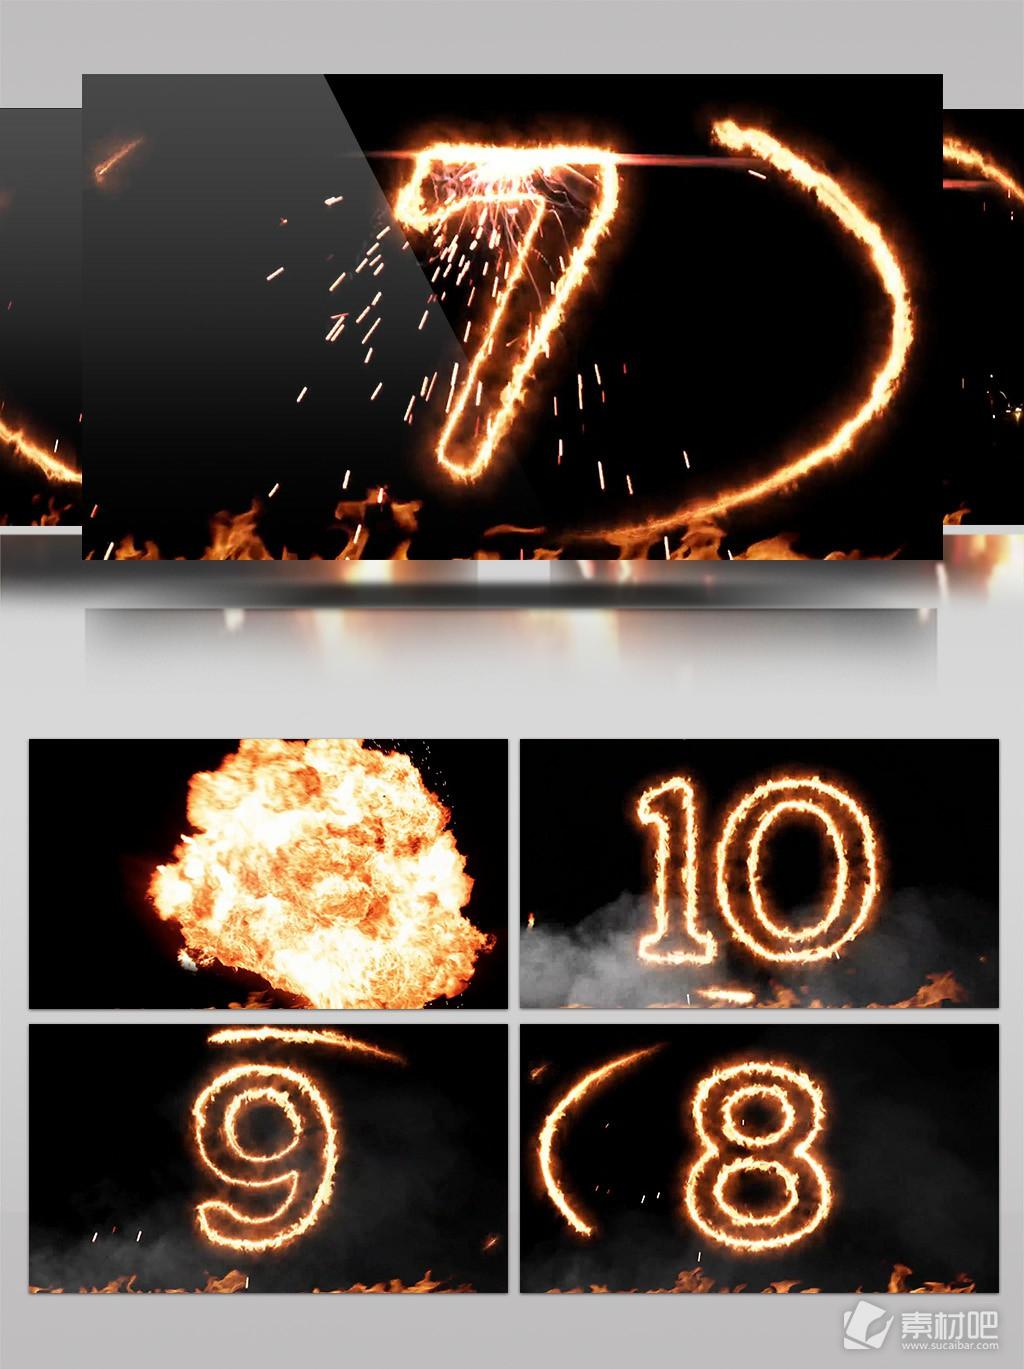 4K火焰爆炸10秒倒计时背景素材